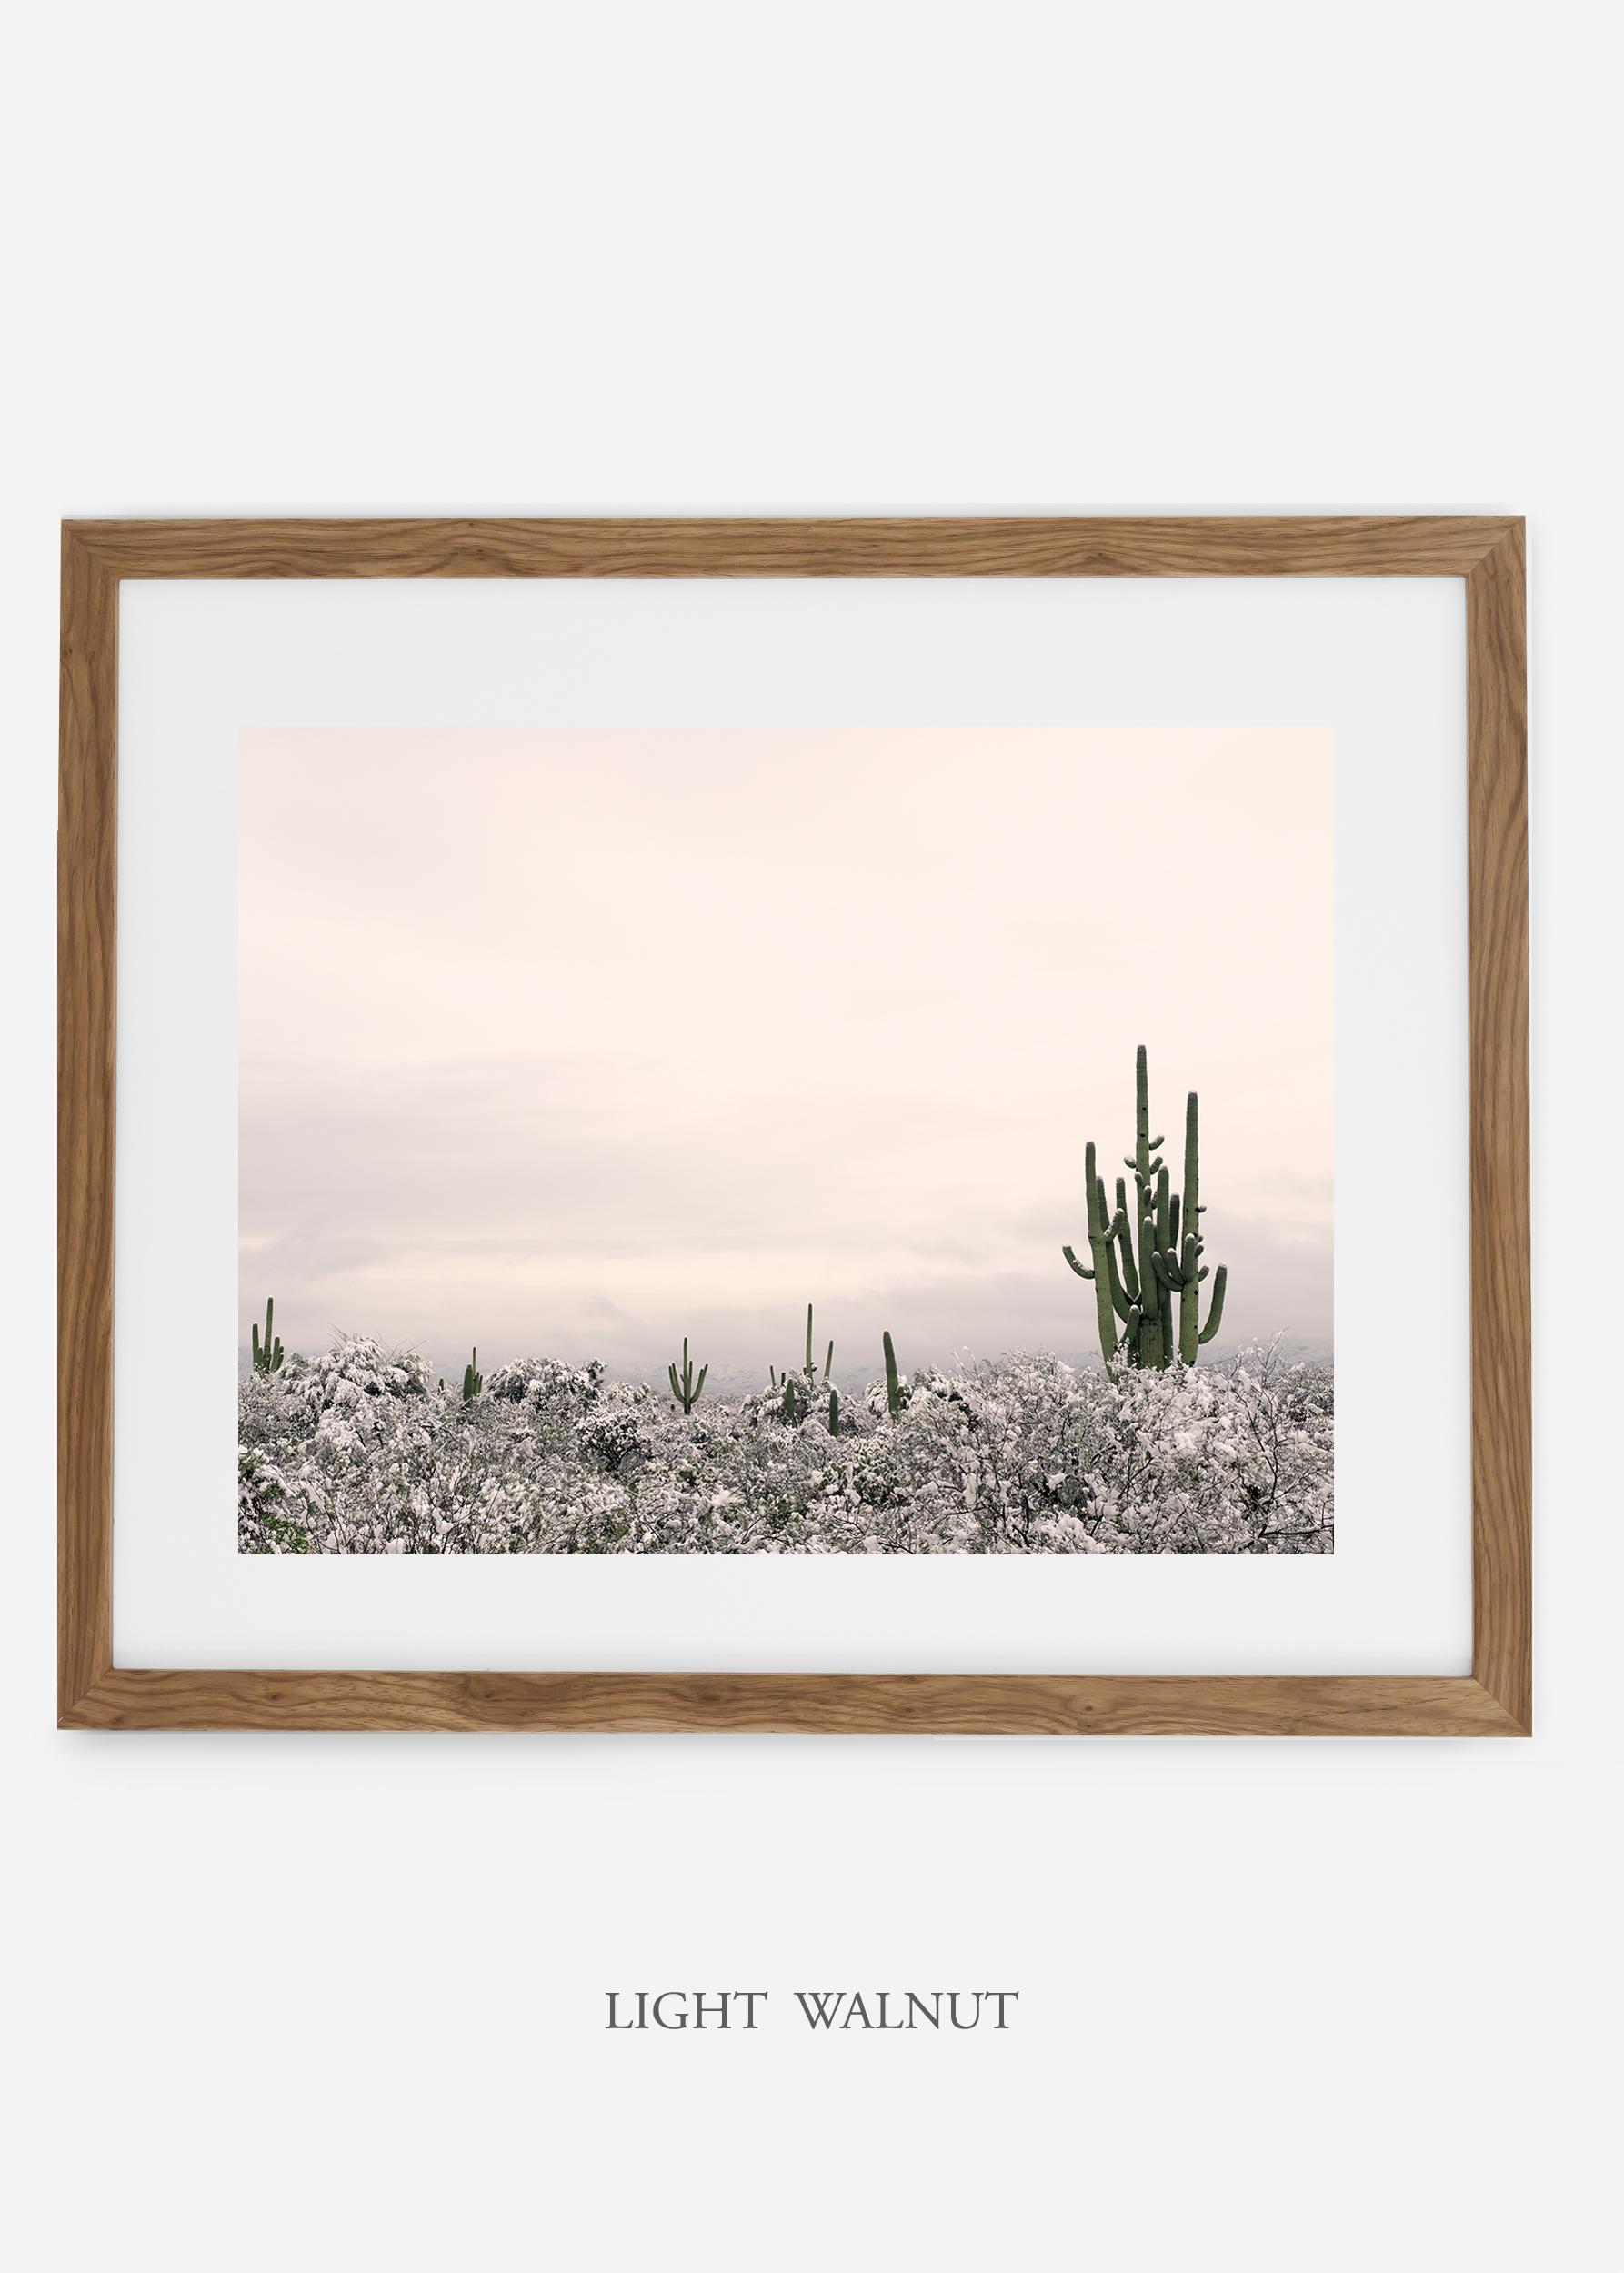 lightwalnutframe-saguaroNo.7-wildercalifornia-art-wallart-cactusprint-homedecor-prints-arizona-botanical-artwork-interiordesign.jpg